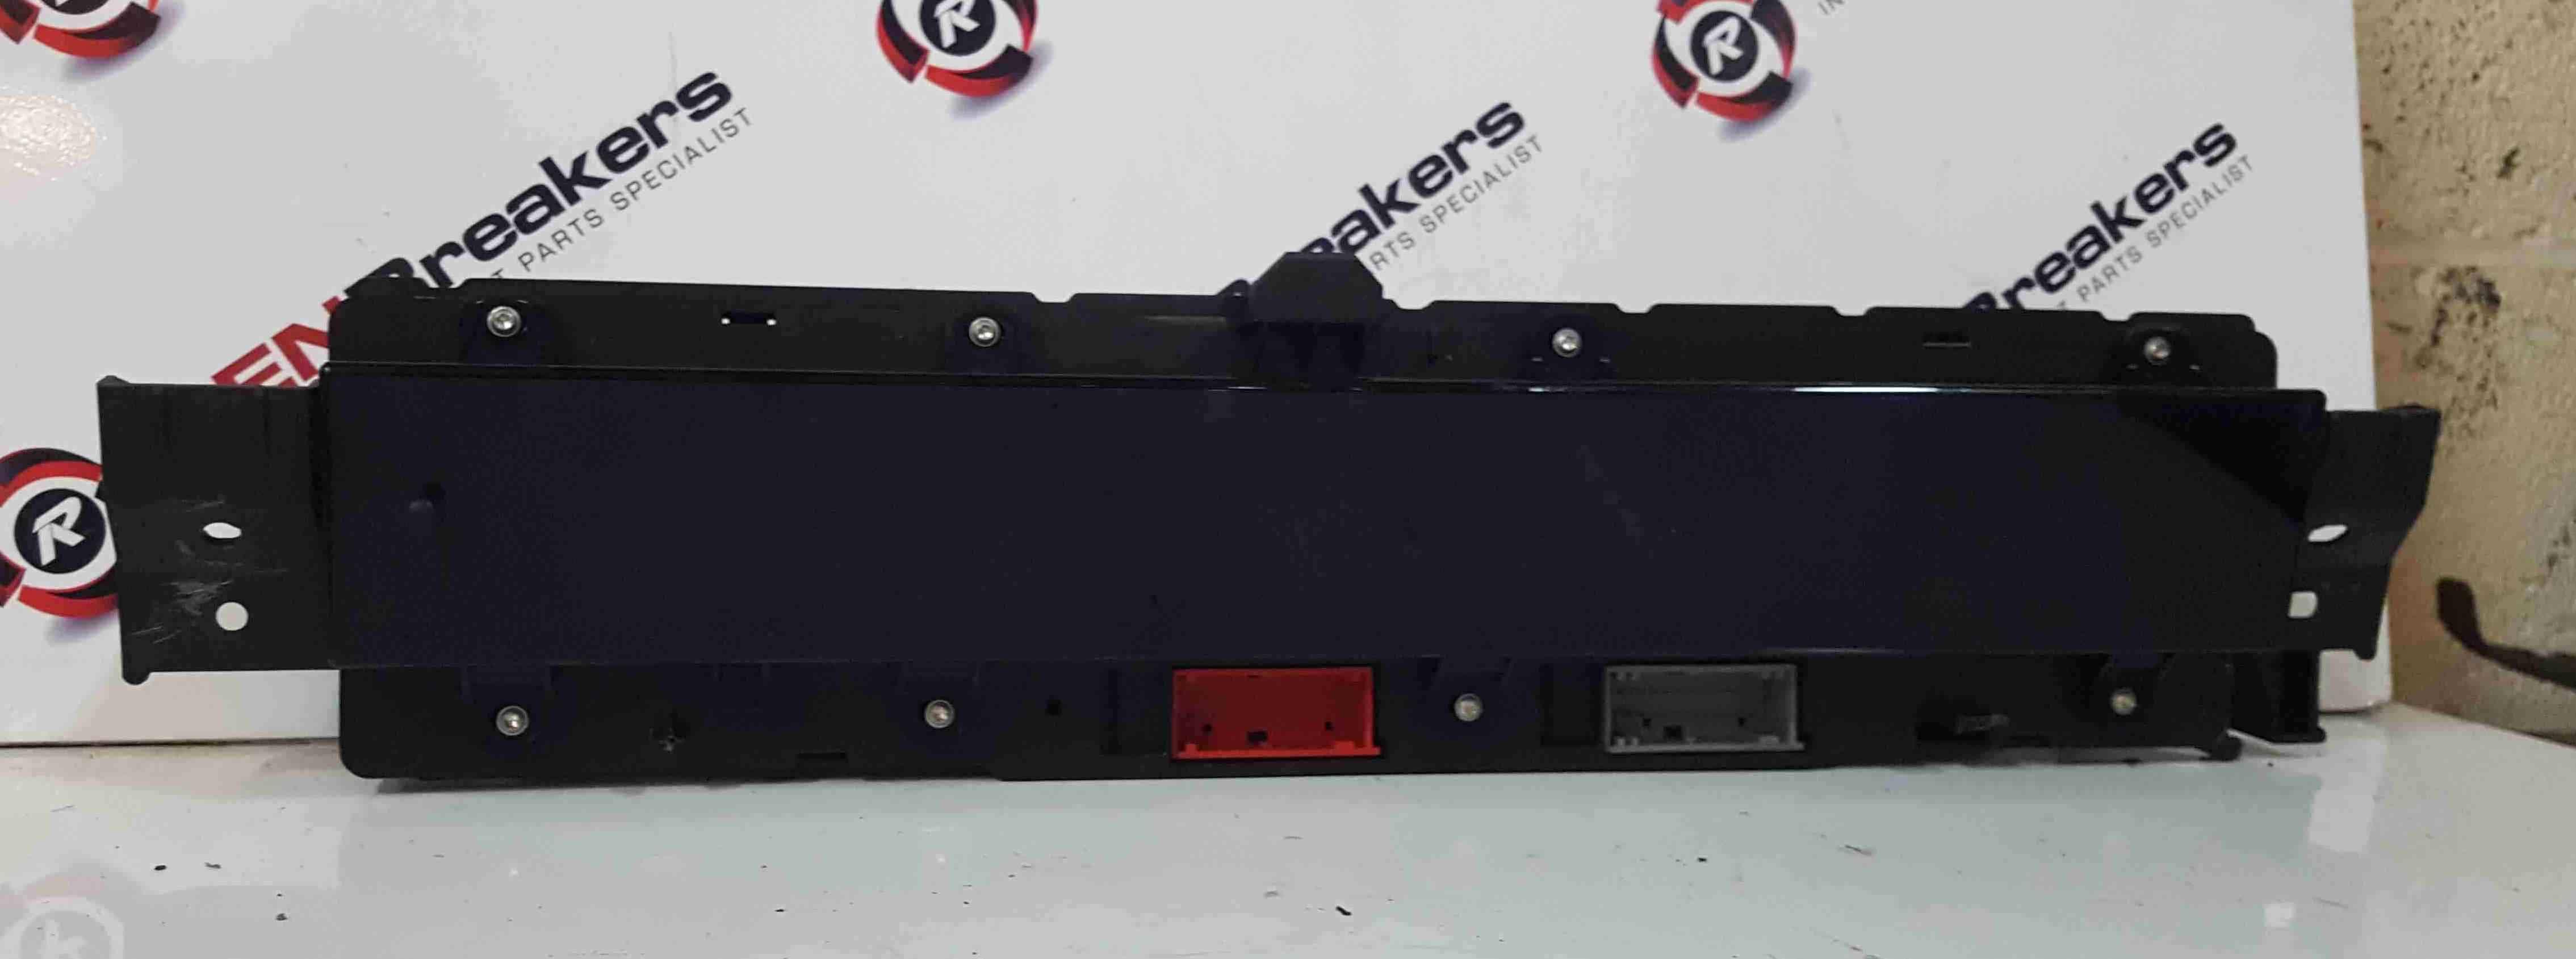 Renault Espace 2003-2013 Dashboard Clocks Dials Speedo 8200980658